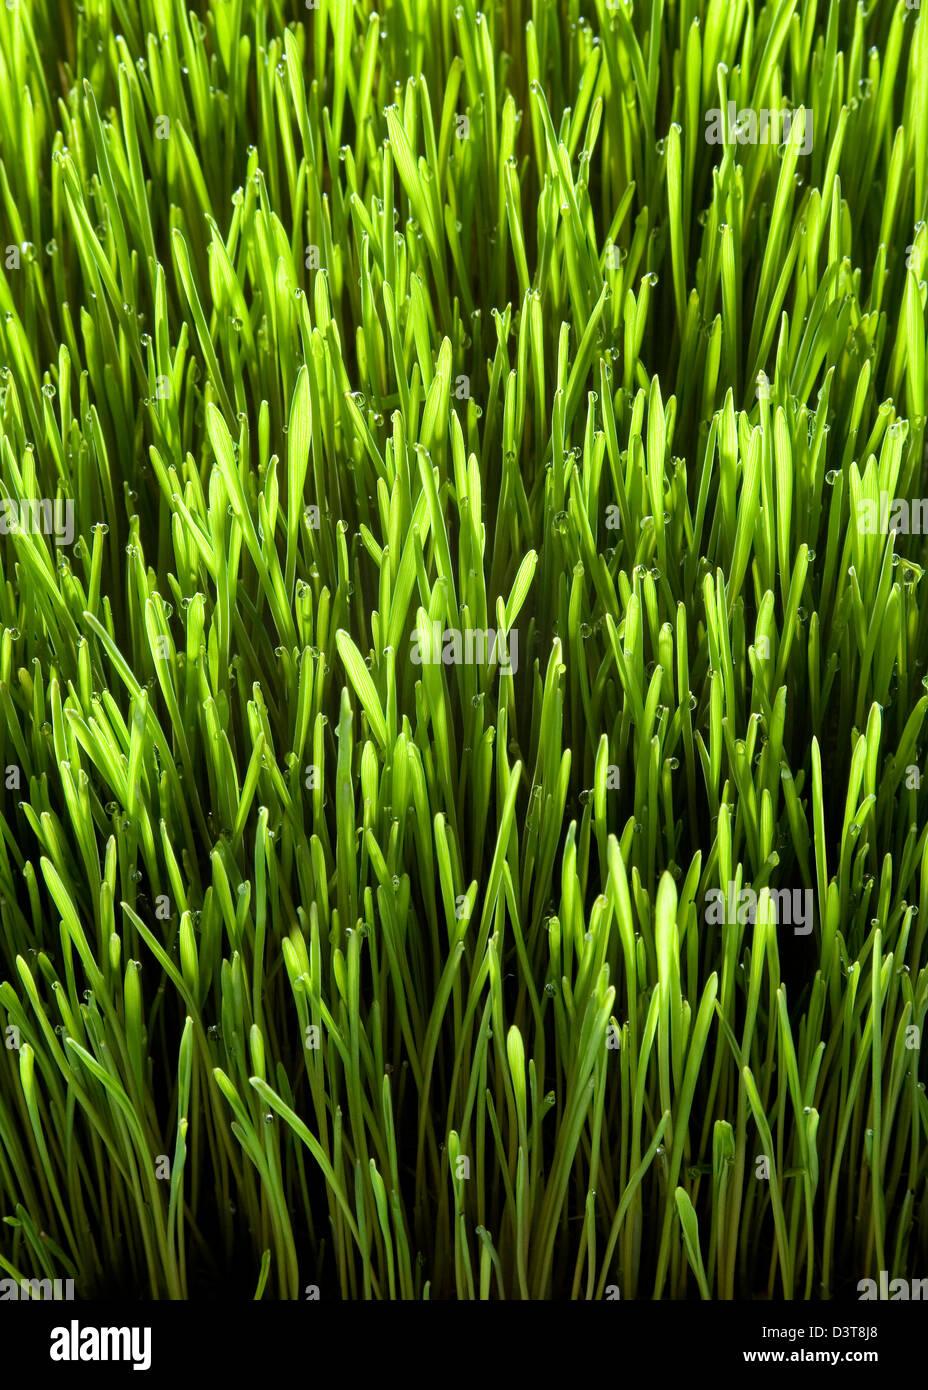 Frischer grüner Weizengras - Nahaufnahme Stockbild